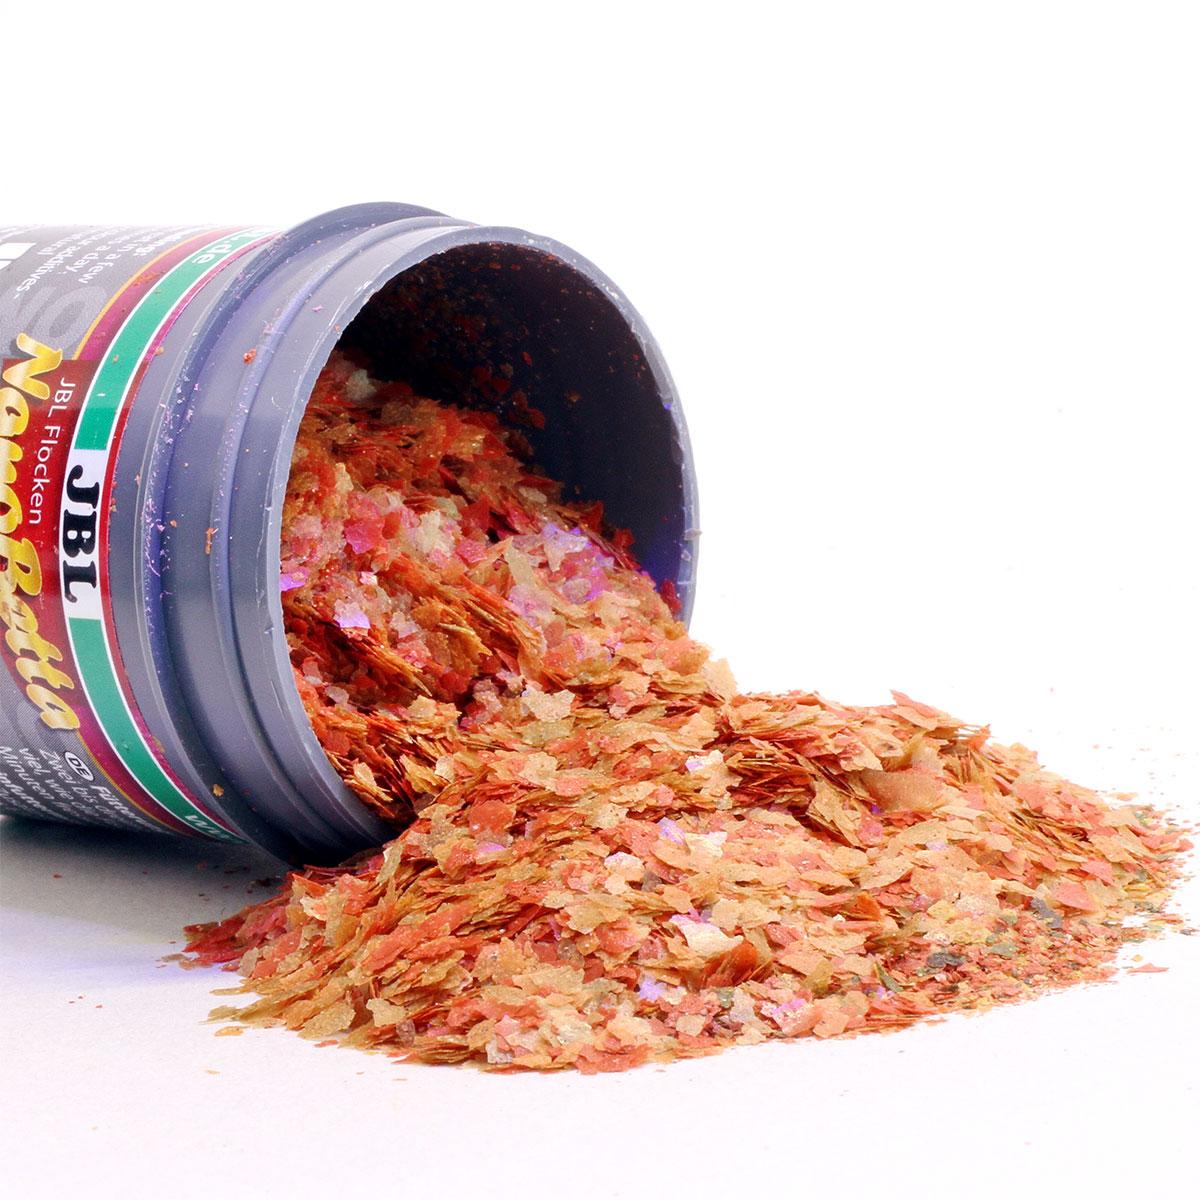 Jbl nanobetta futter f r kampffische 60ml kaufen bei zooroyal for Kampffisch futter